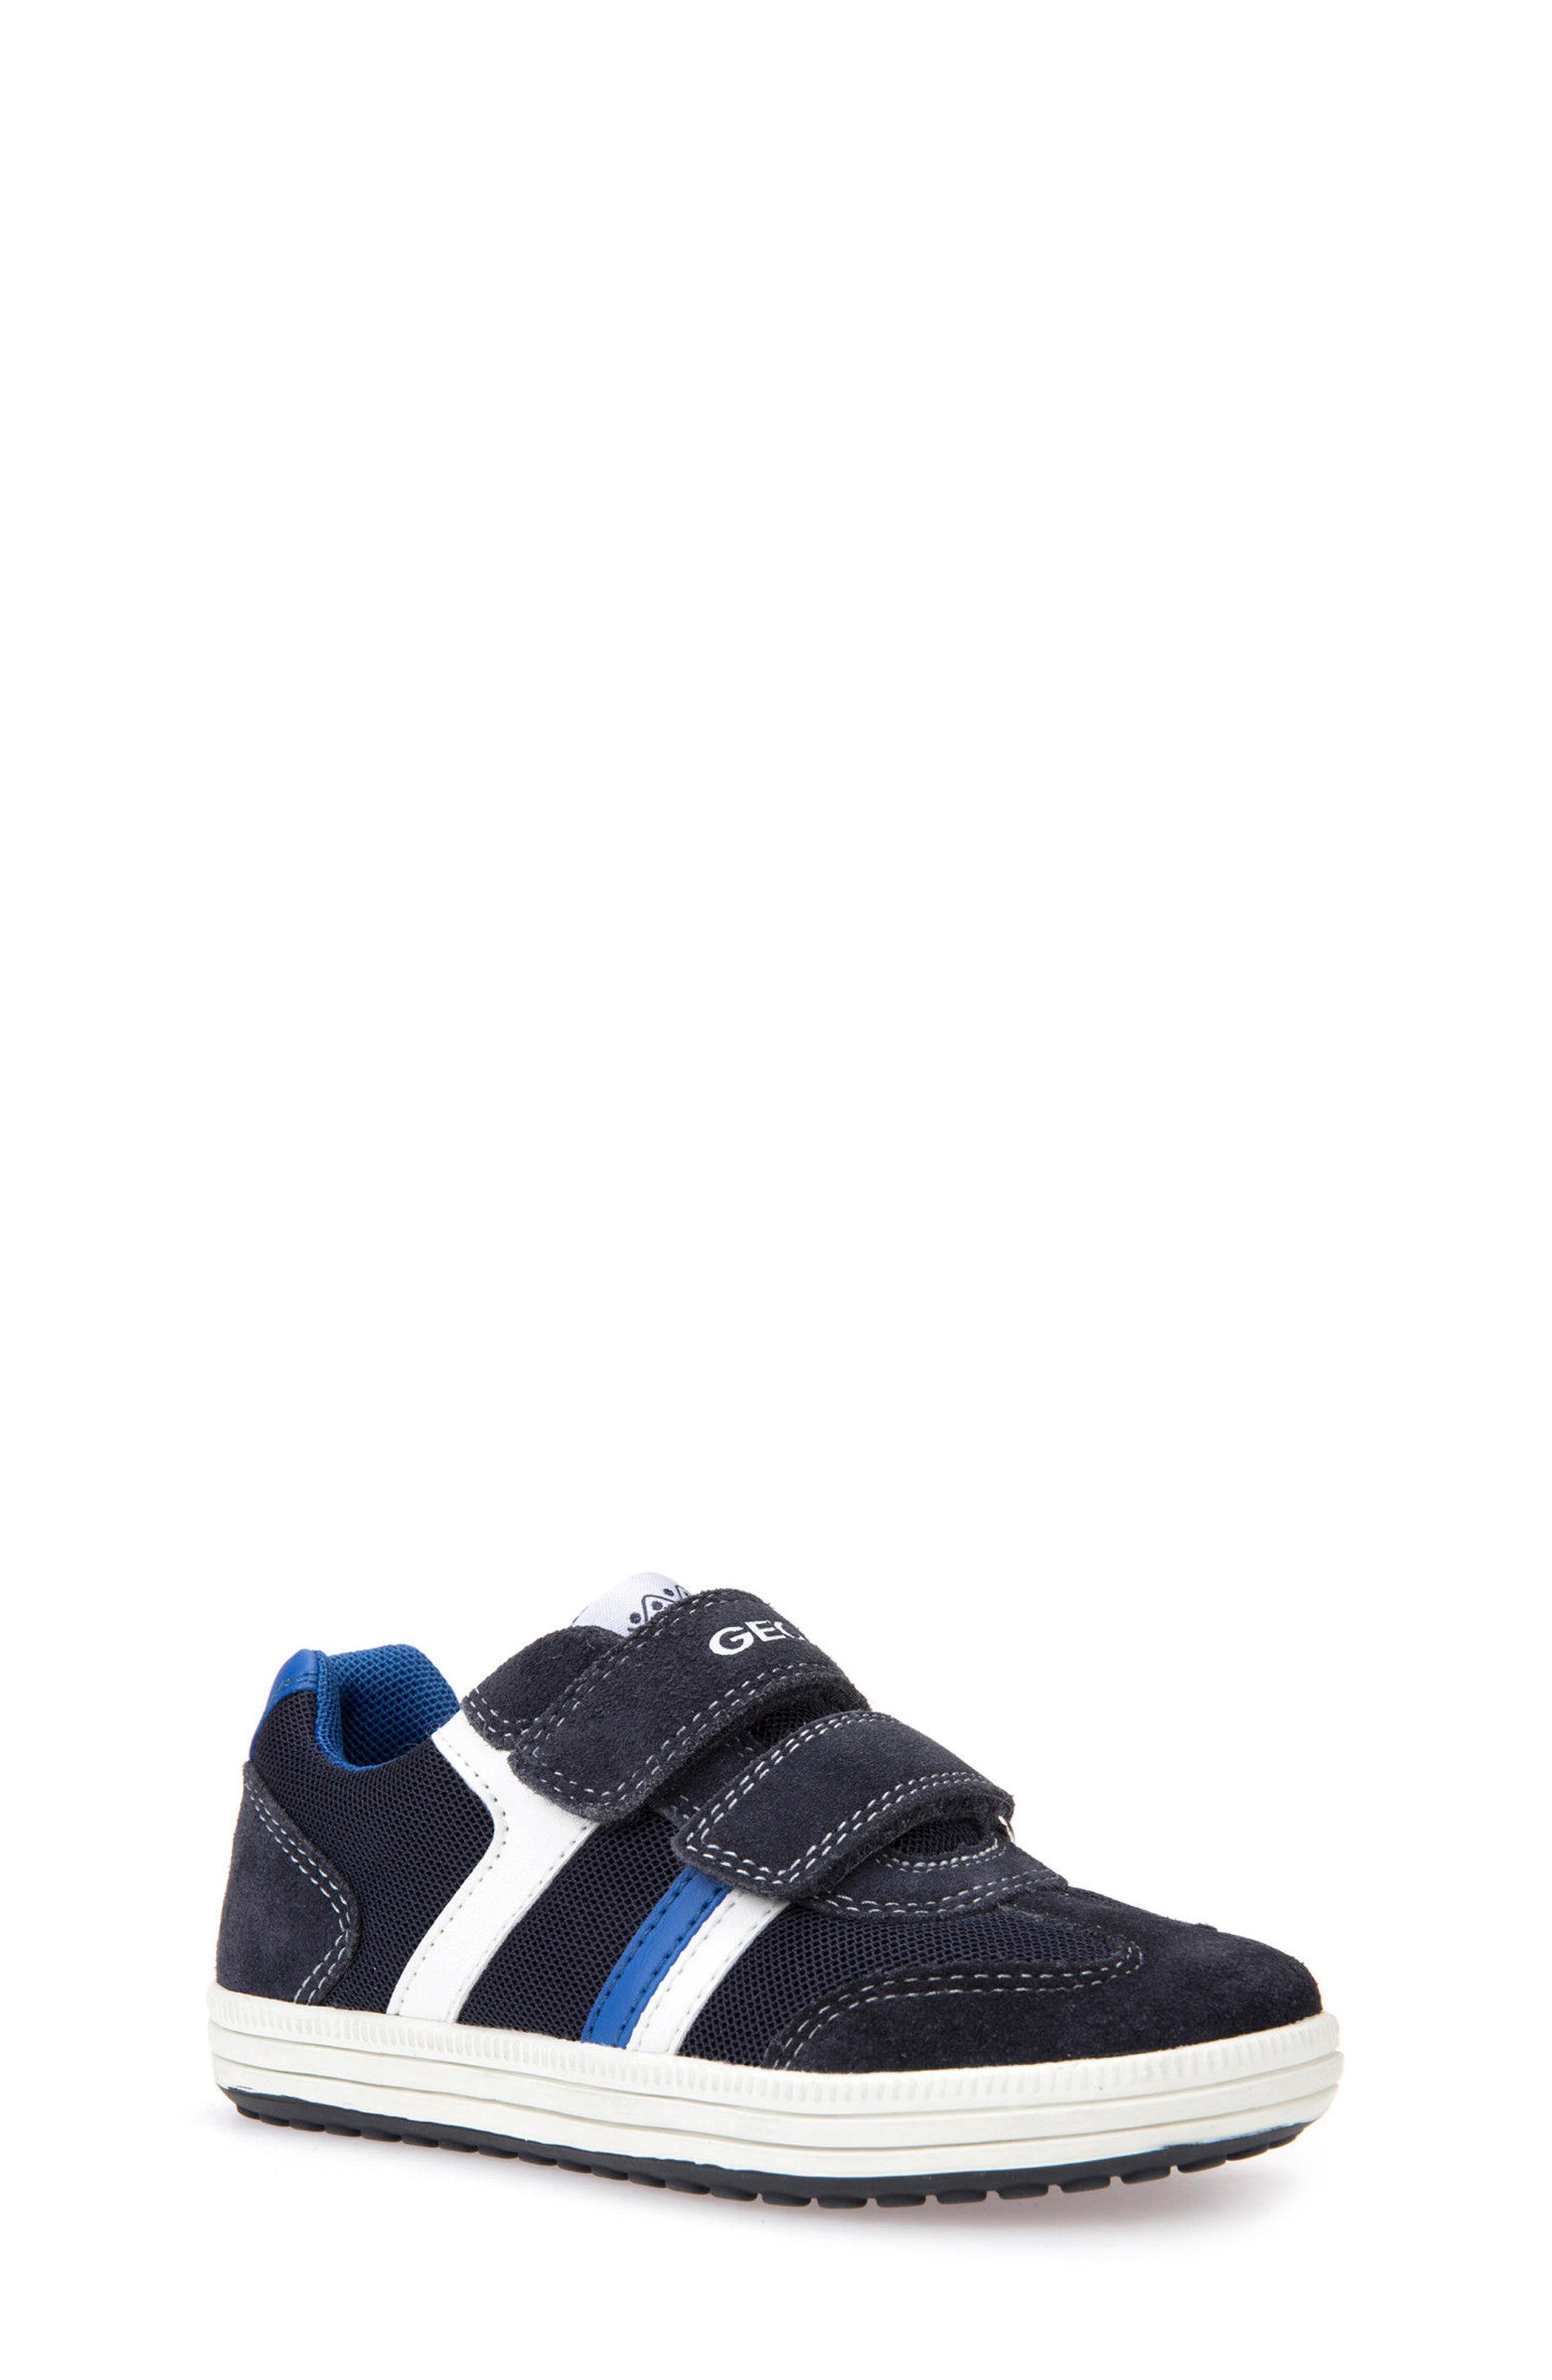 Kilwi Sneaker,                             Main thumbnail 1, color,                             Navy/ White